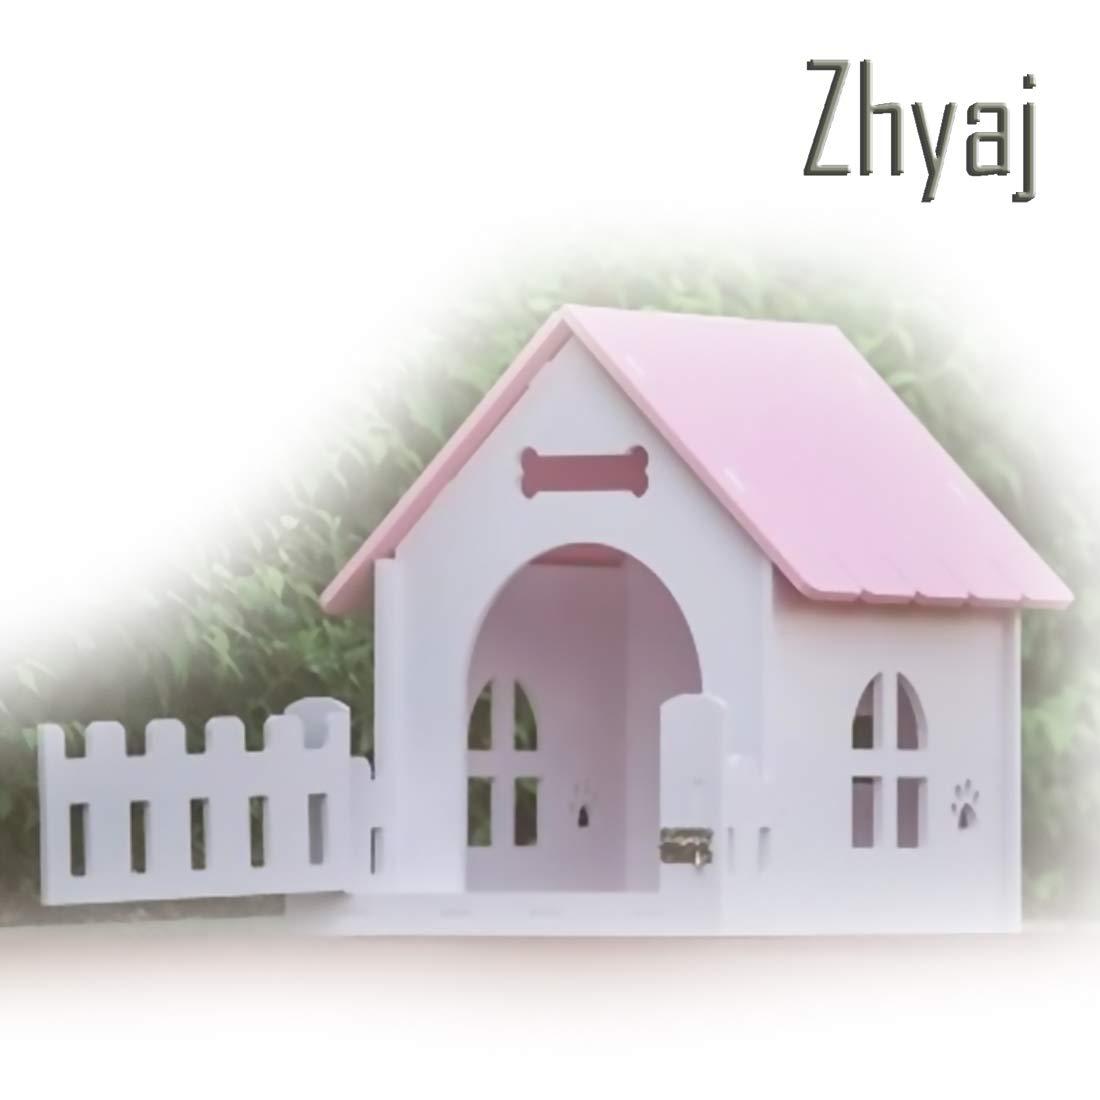 2 BZhyaj Outside Dog Kennel Cat Nest Ventilation Breathable Outdoor Dog Villa Summer Pet Dog Bed Outdoor Dog House,1,A